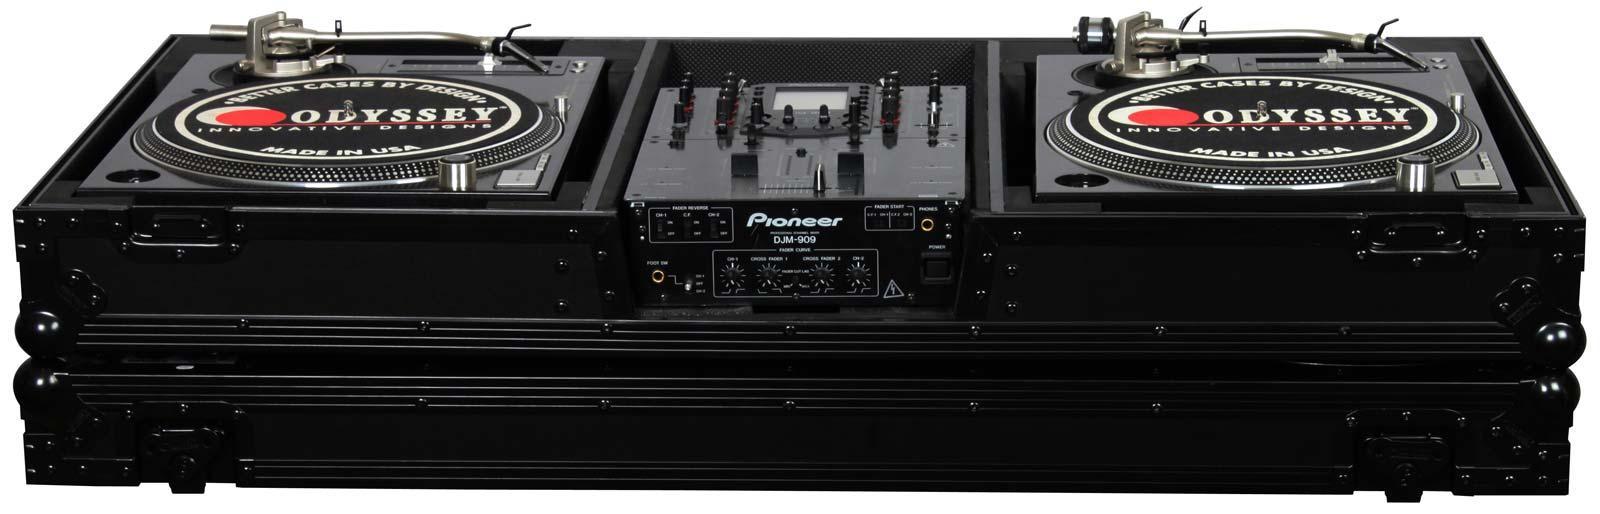 "Odyssey FZBM10W 10/"" Mixer 2 Turntables In Battle Mode Flight Case"